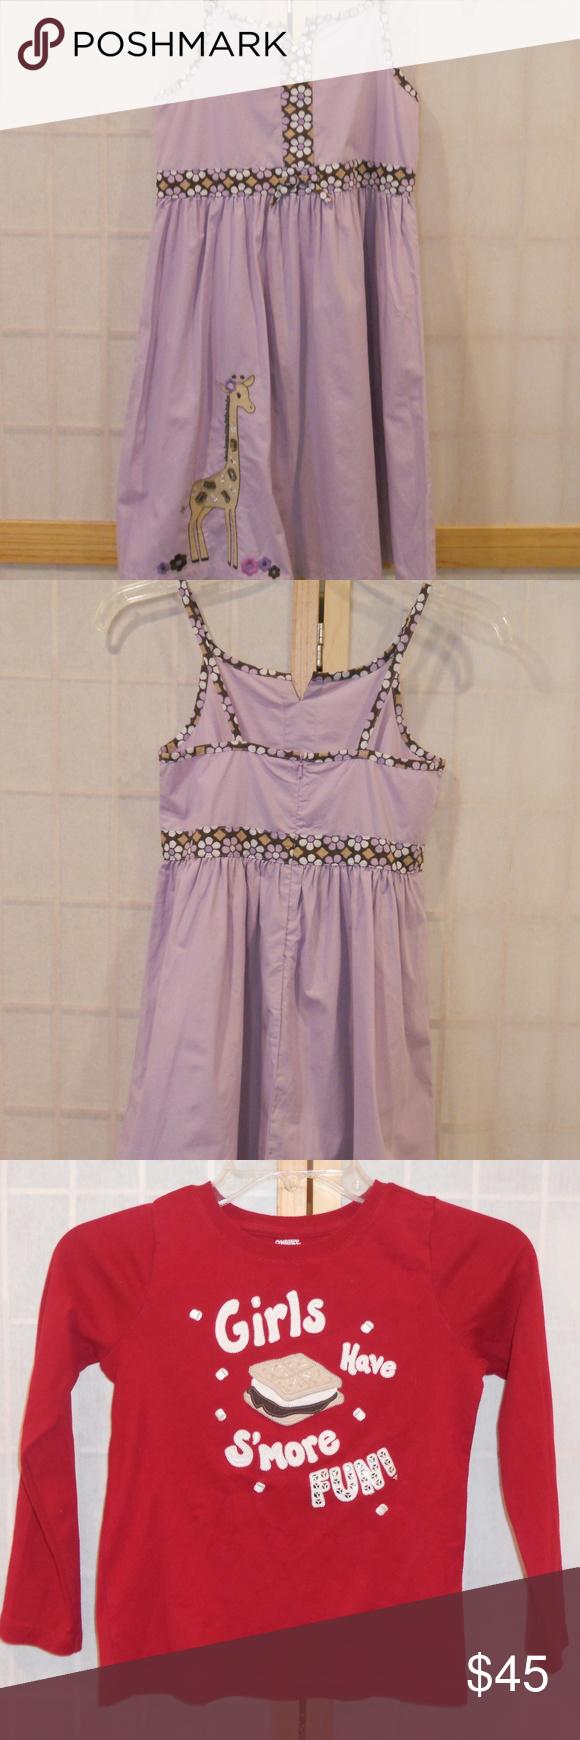 Gymboree girlus dress u shirt piece bundle sz nwt gymboree